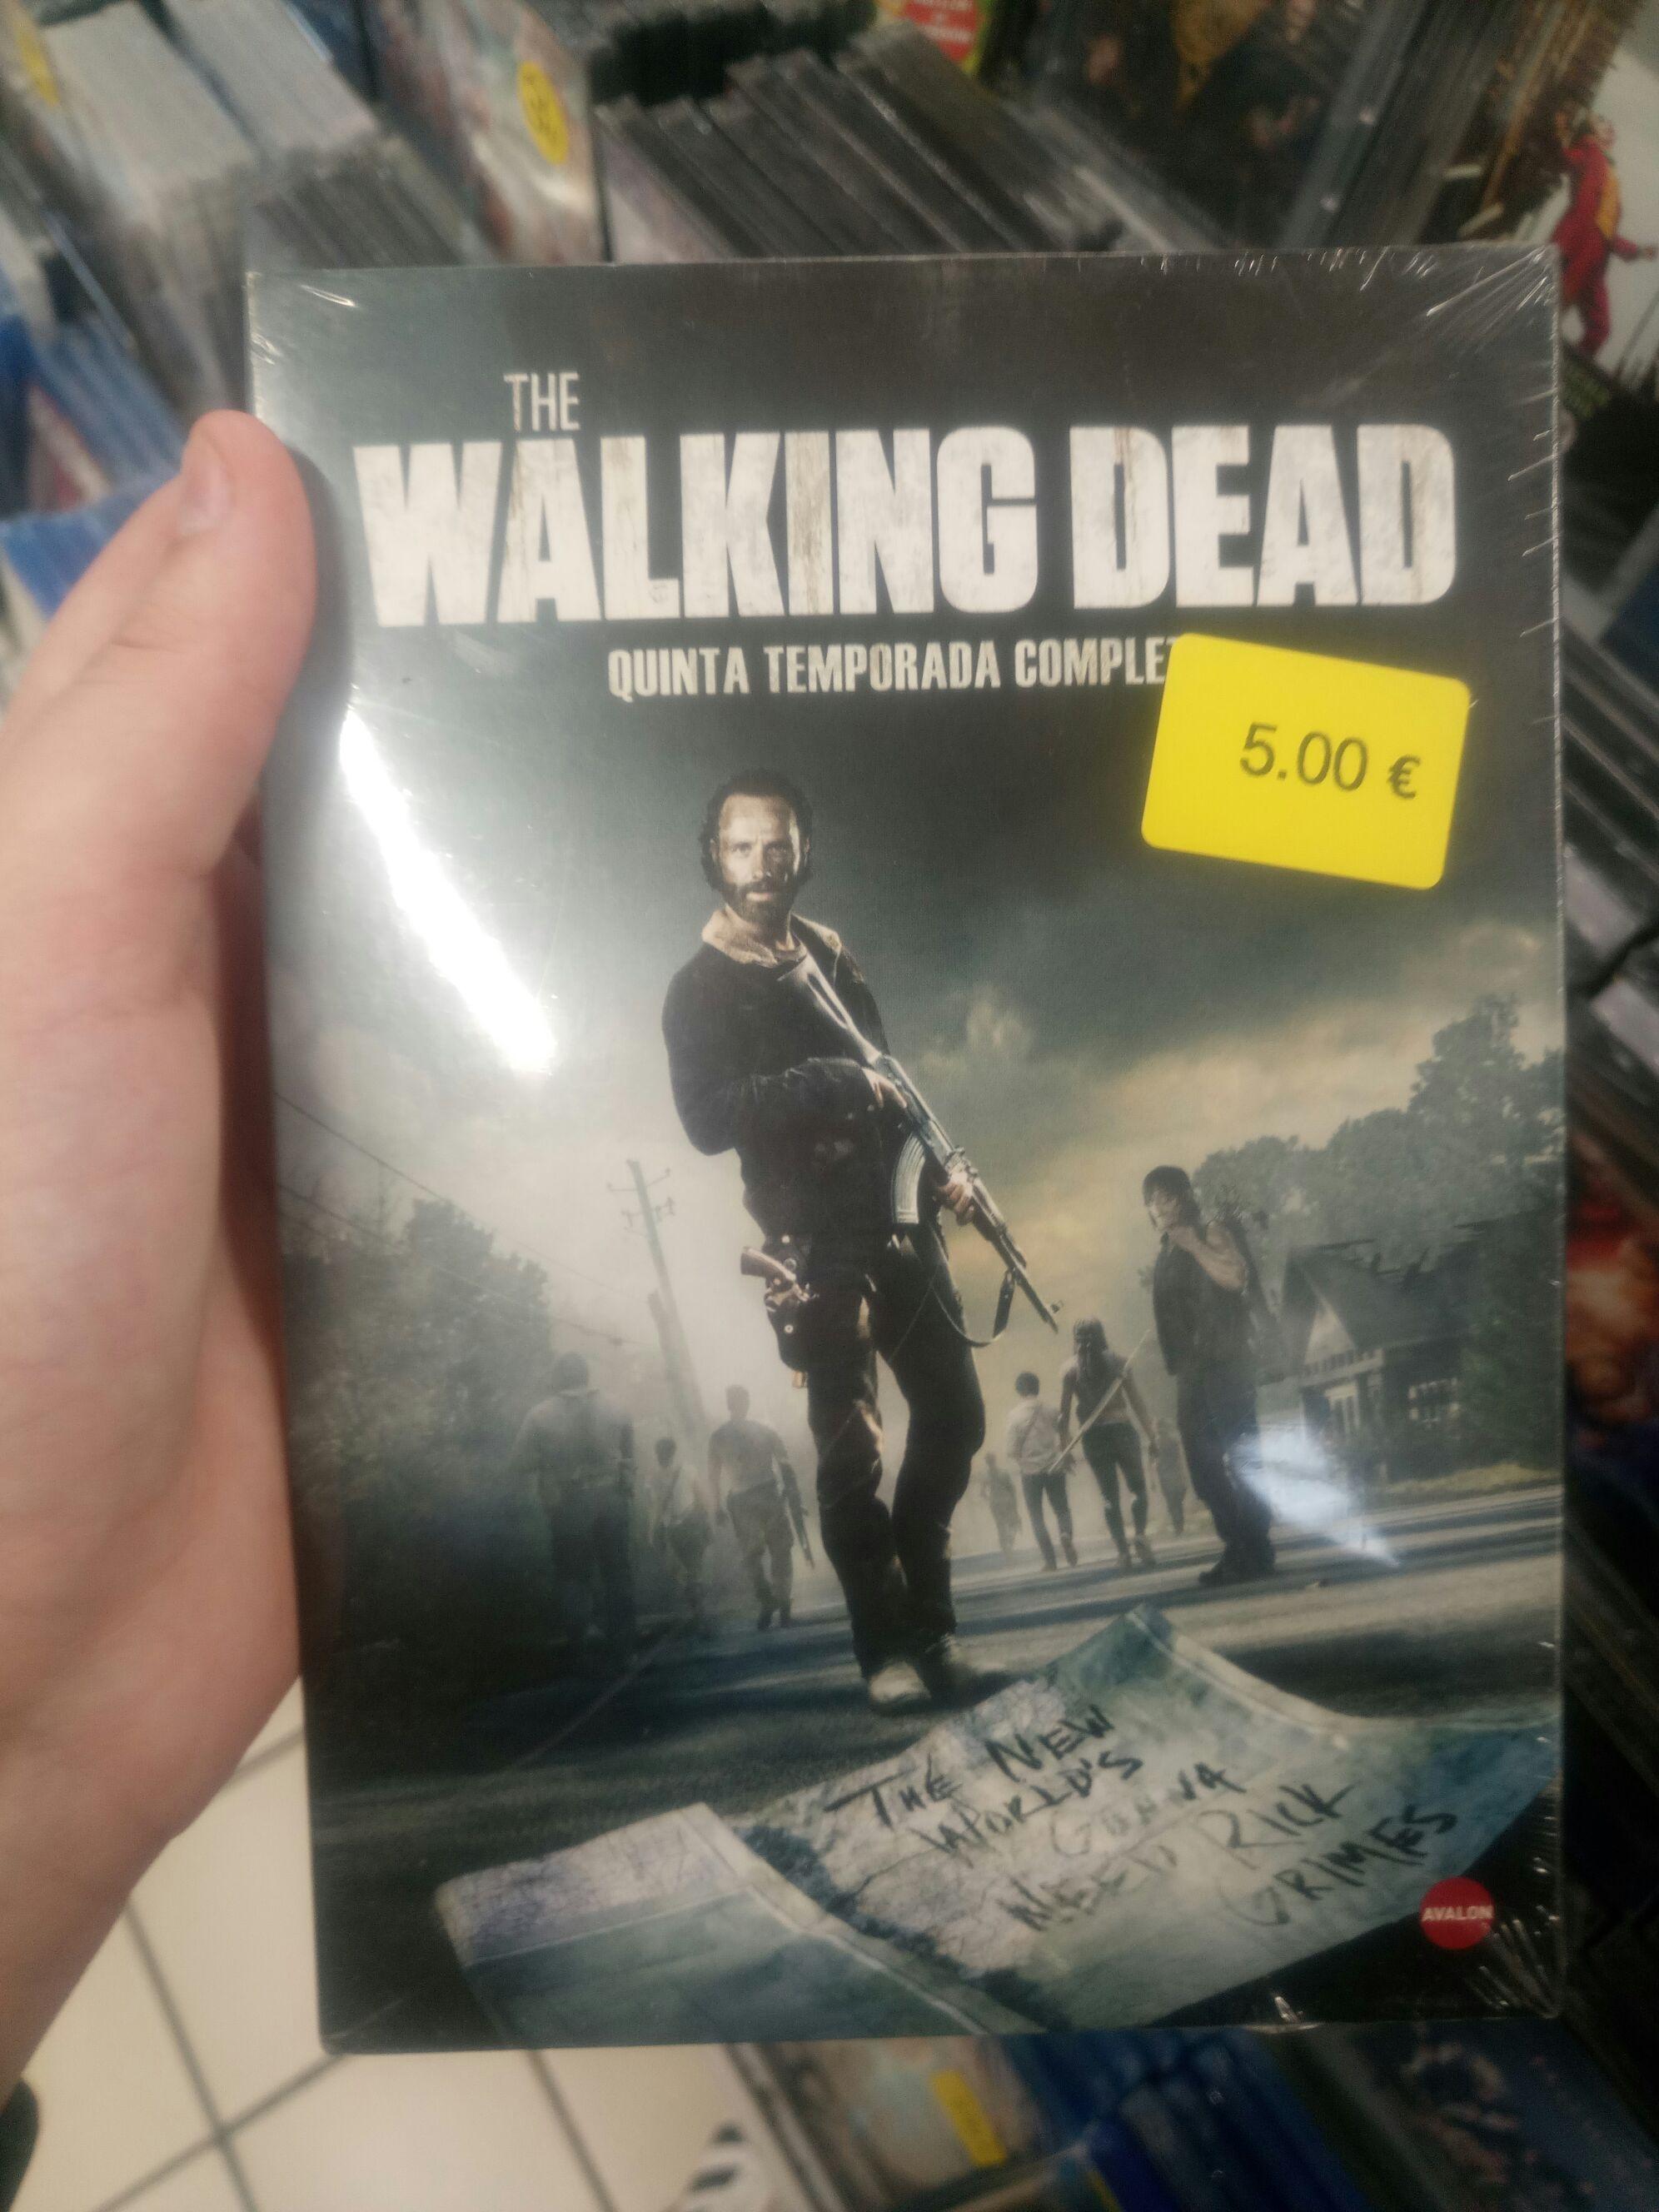 The Walking Dead, Temporada 5 Completa en DVD, CARREFOUR MONTEQUINTO (SEVILLA)